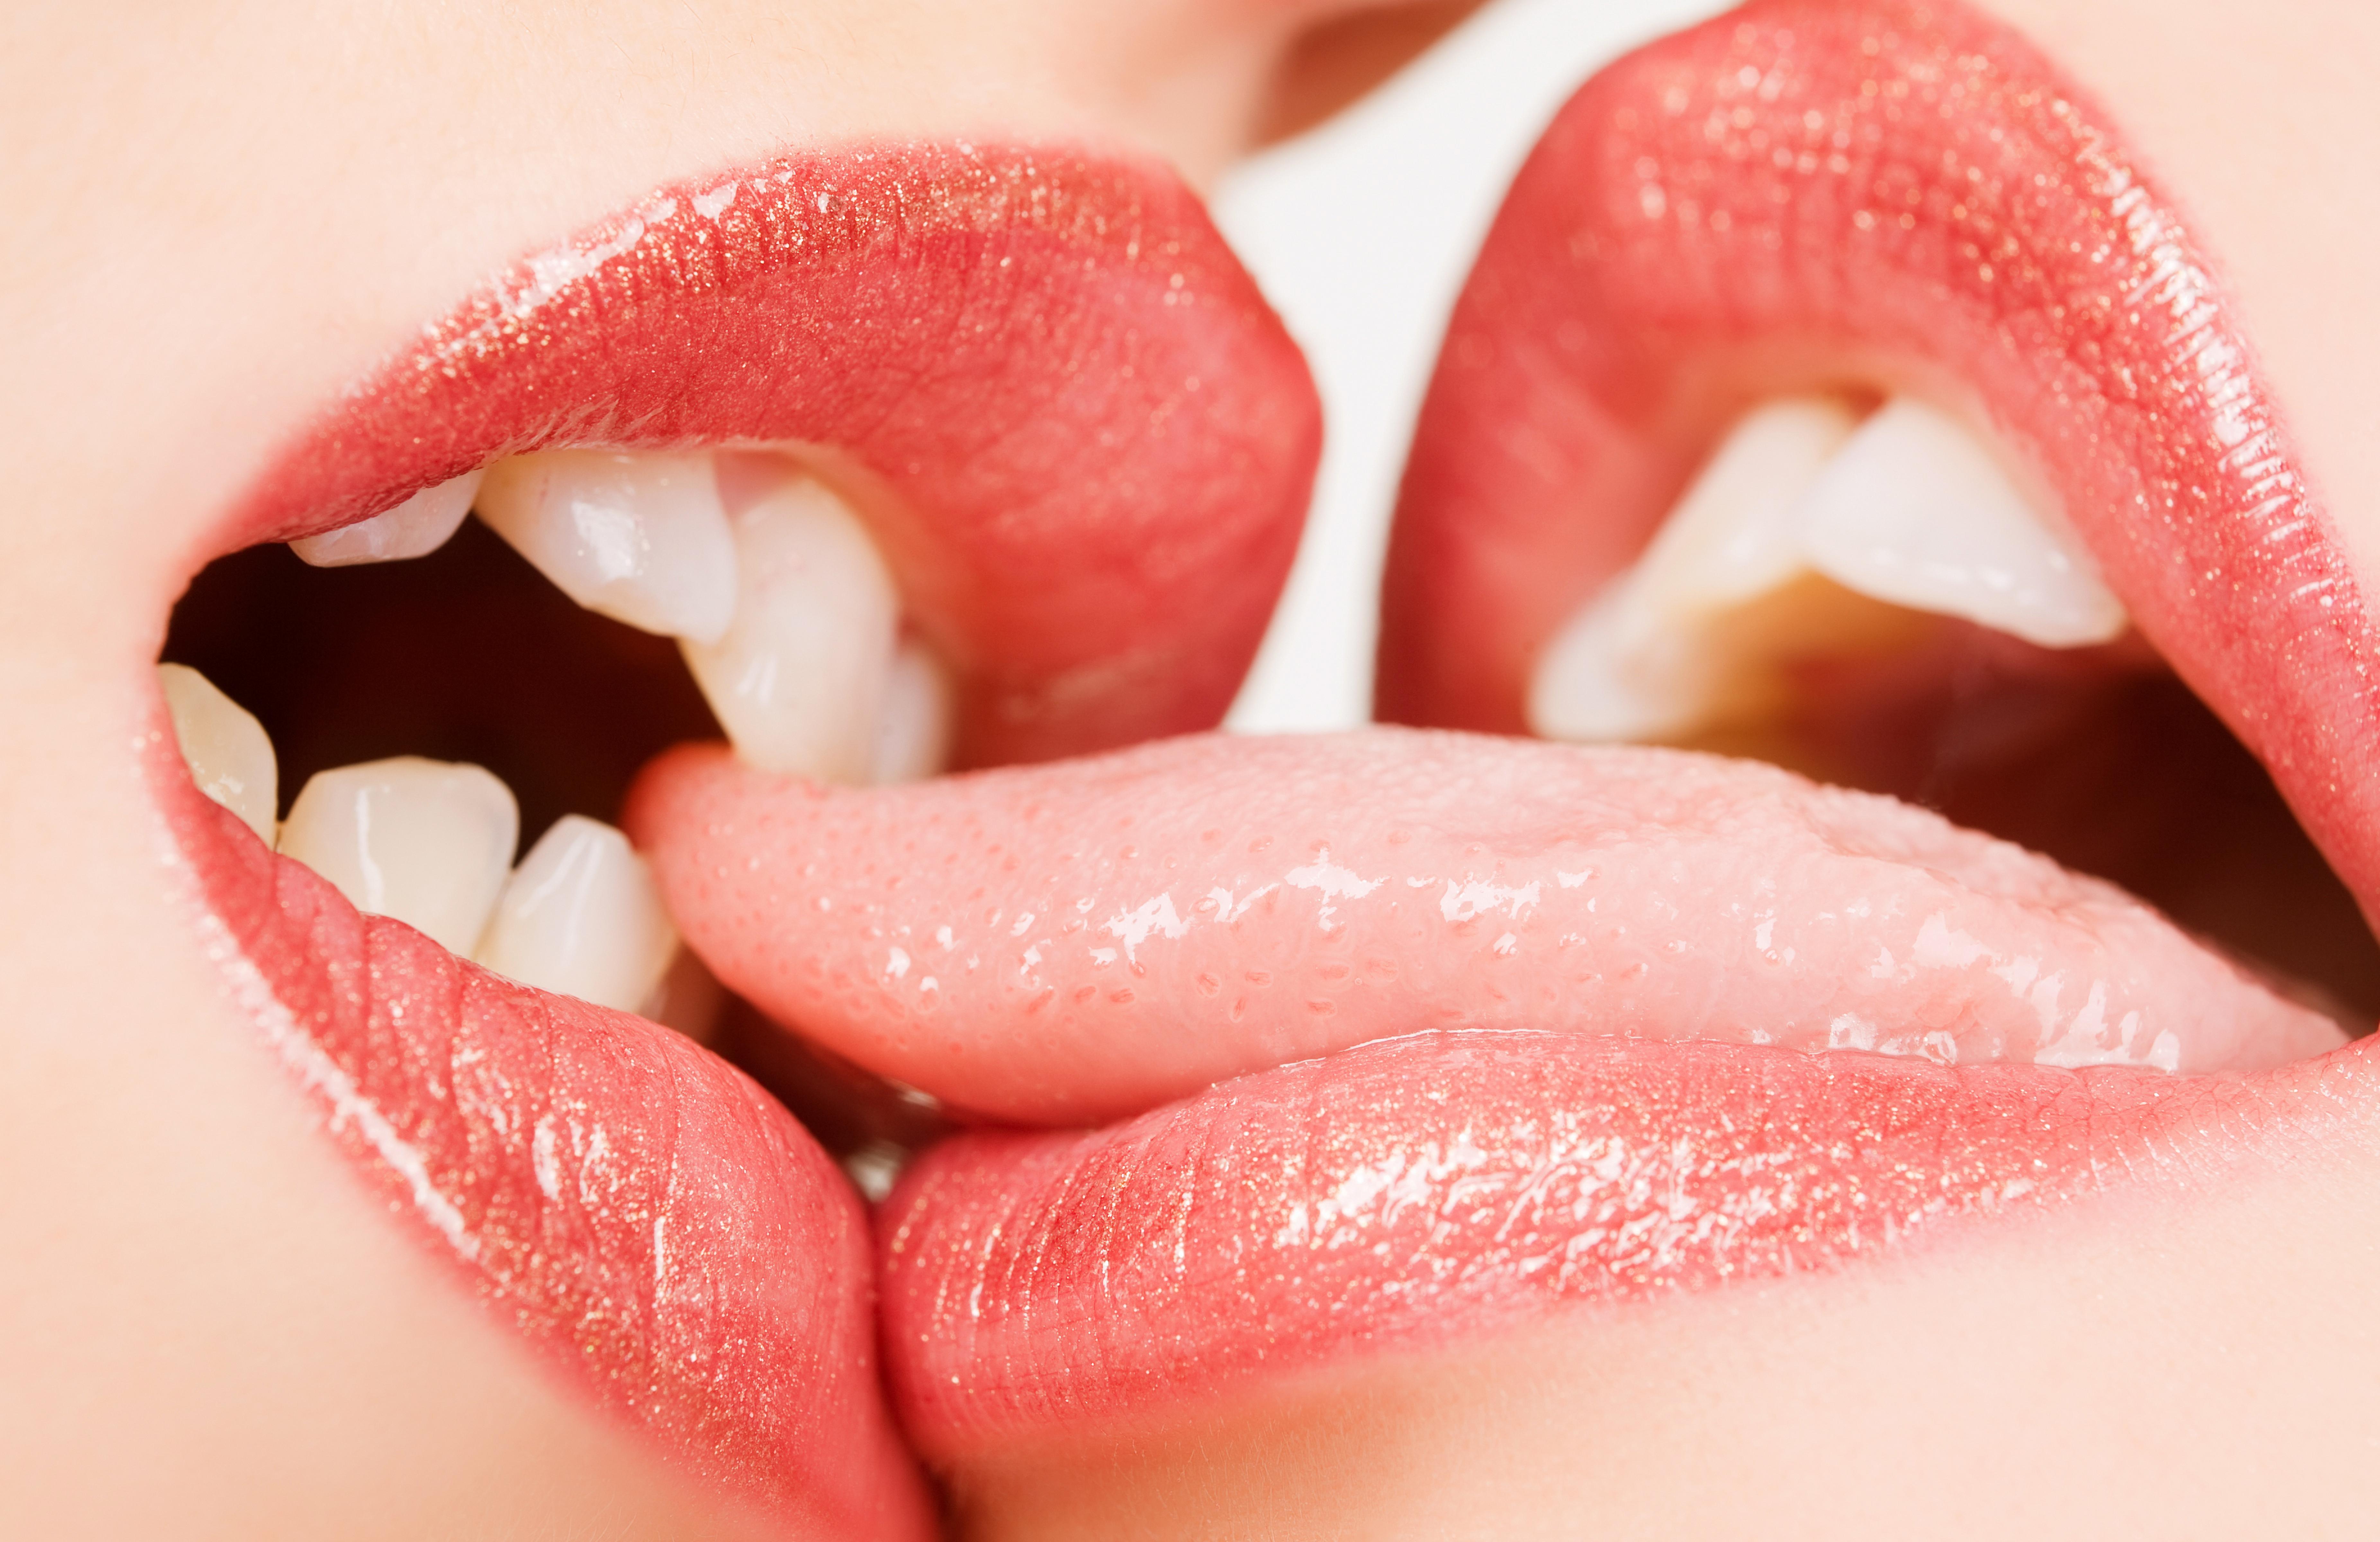 3 Lesbians Tongue Kissing wallpaper : face, women, model, red, lipstick, lips, kissing